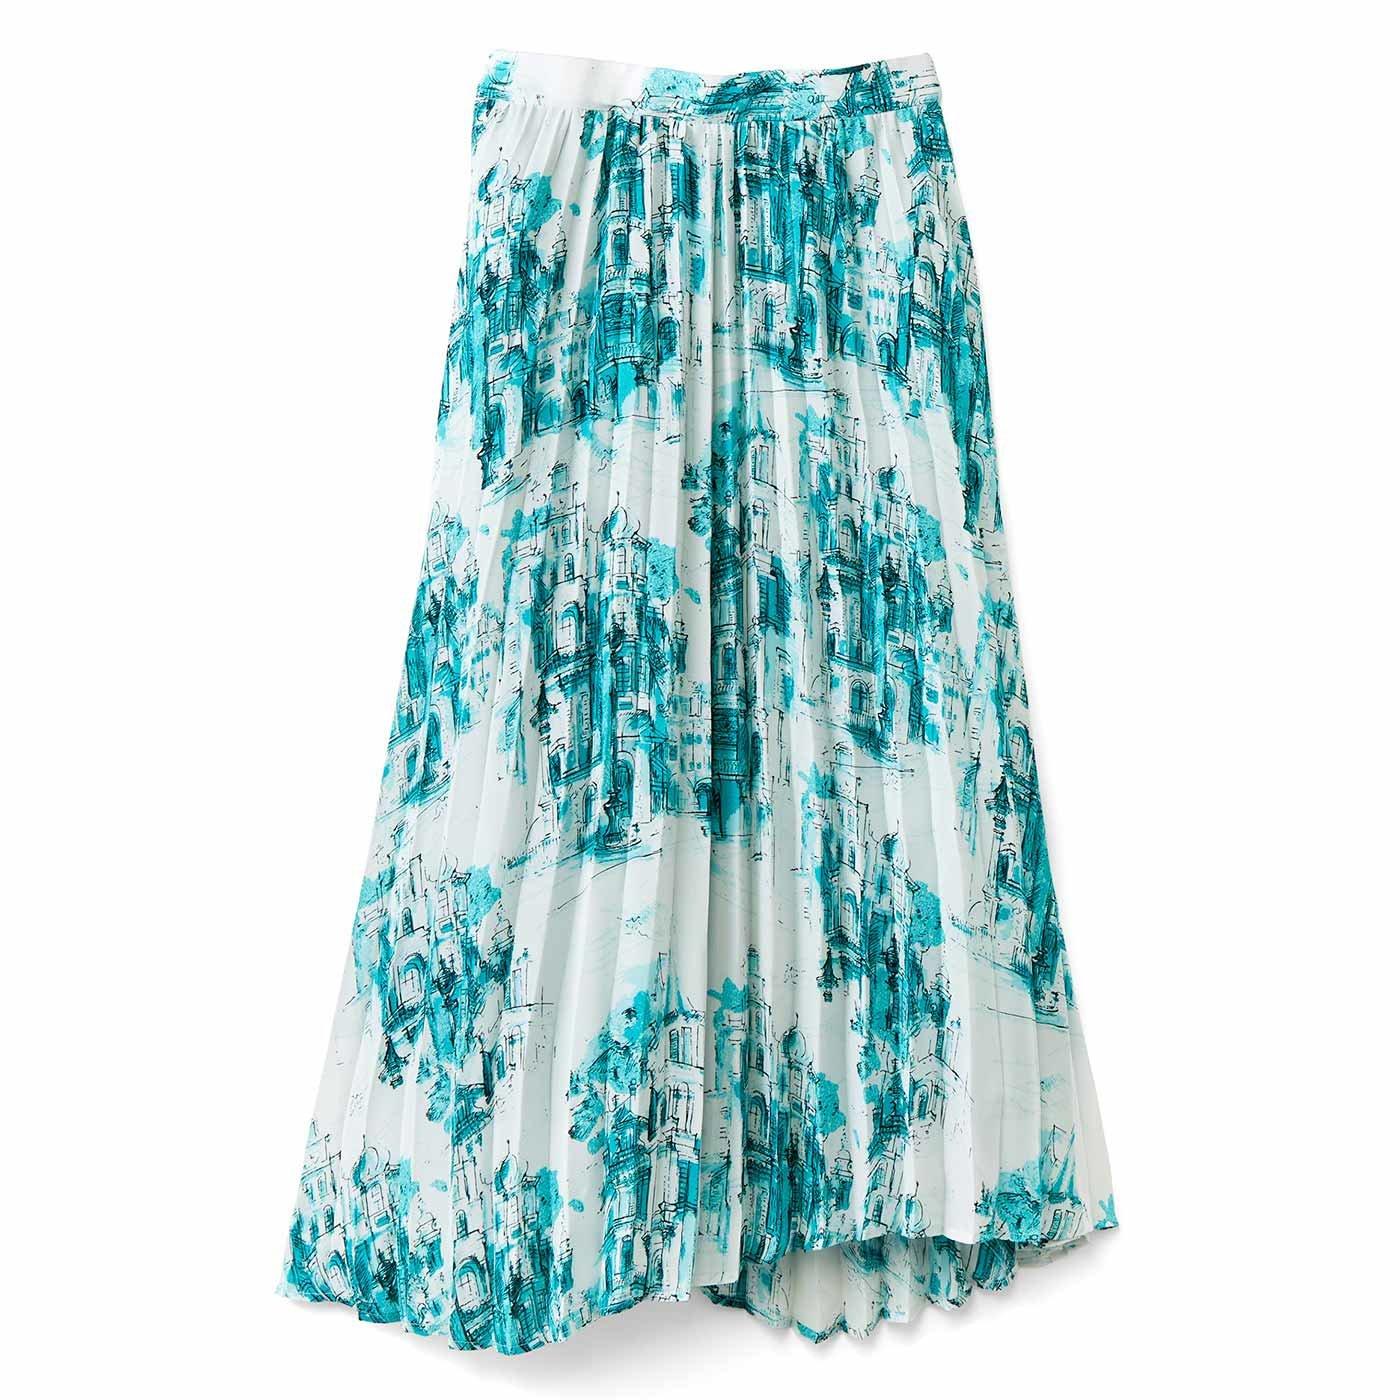 IEDIT[イディット] ヴィンテージライクな趣のプリントプリーツスカート〈グリーン〉